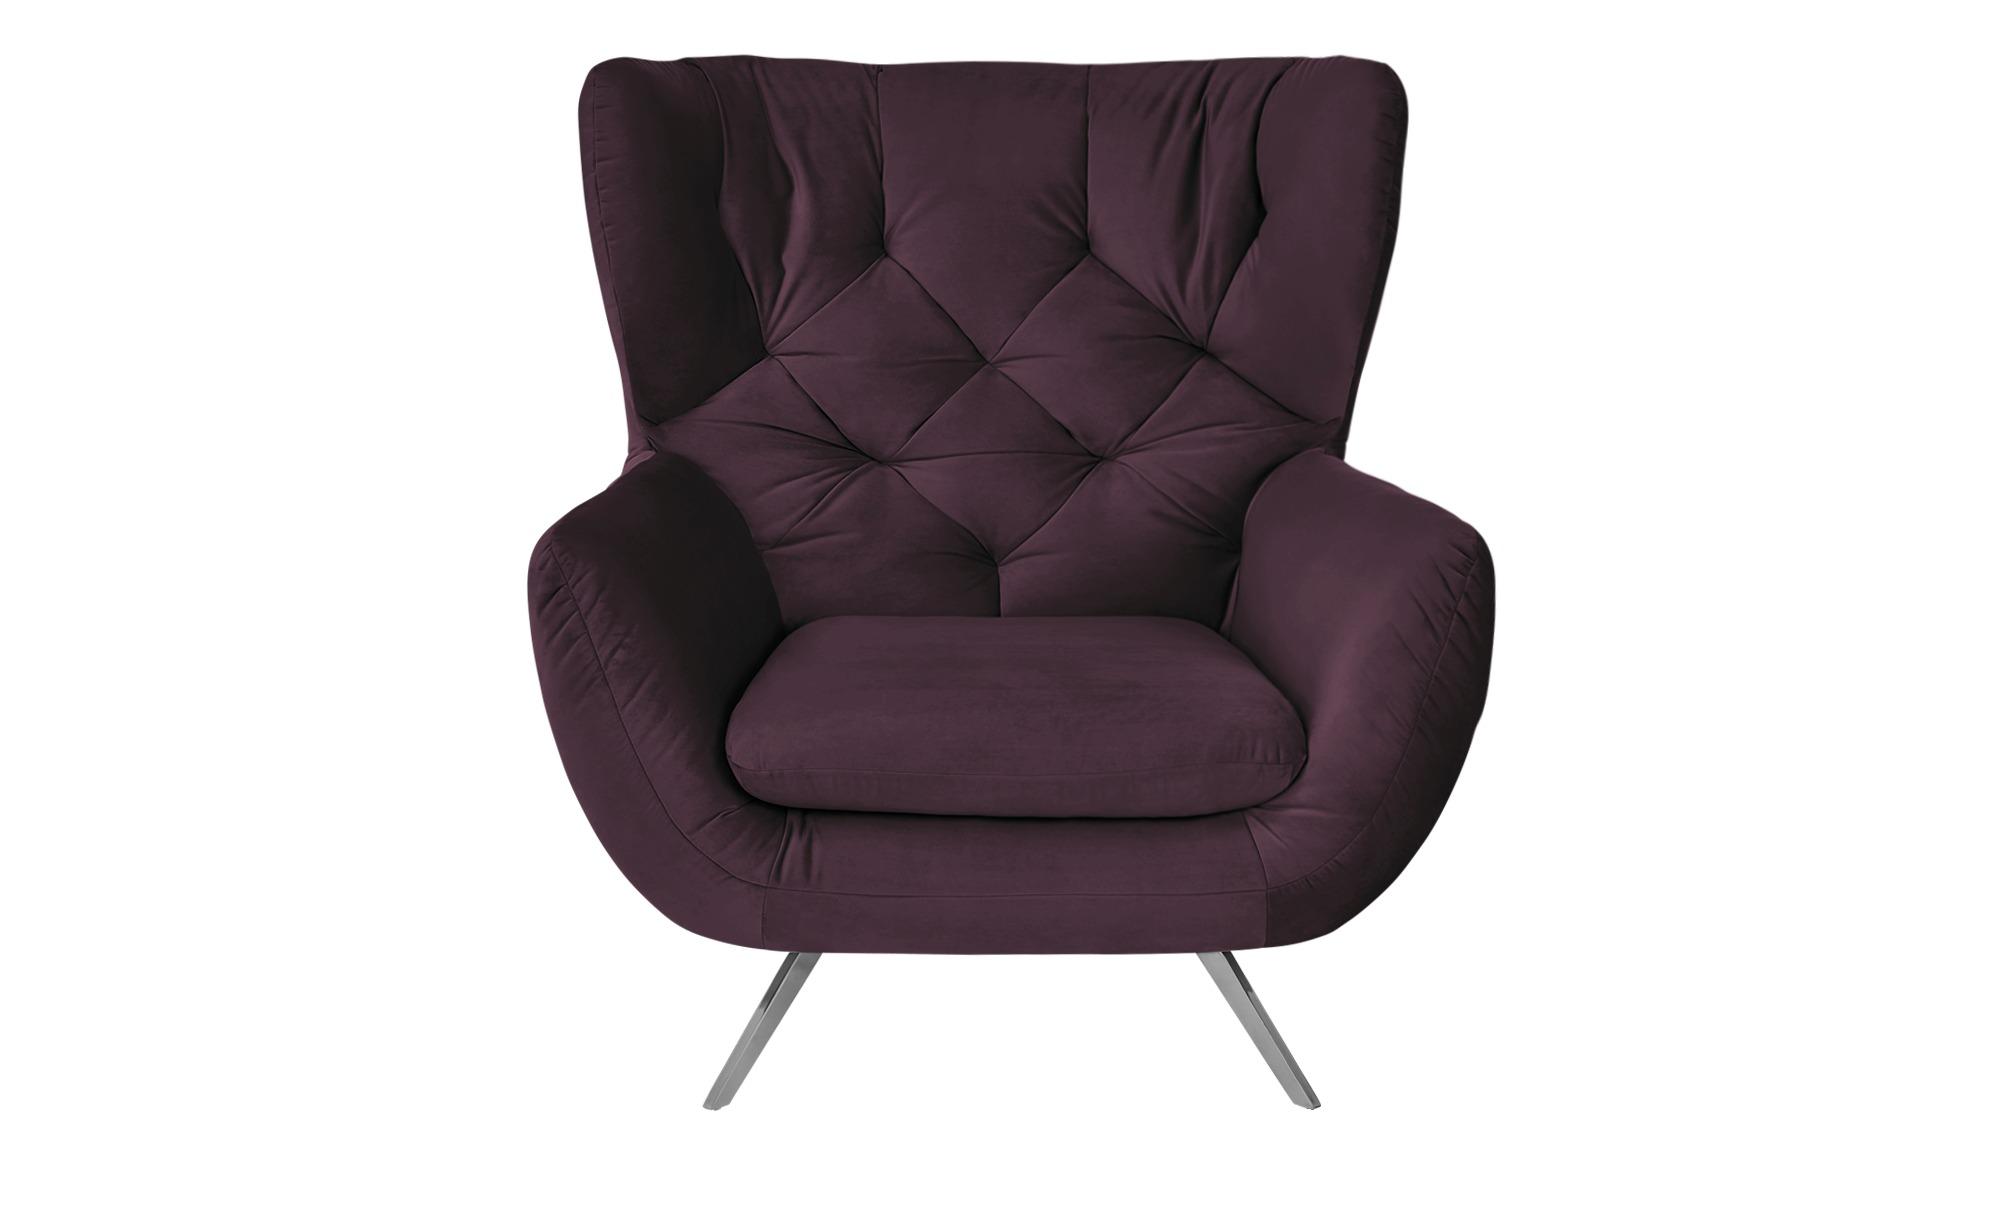 pop Hochlehnsessel  Caldara ¦ lila/violett ¦ Maße (cm): B: 100 H: 106 T: 95 Polstermöbel > Sessel > Ohrensessel - Höffner